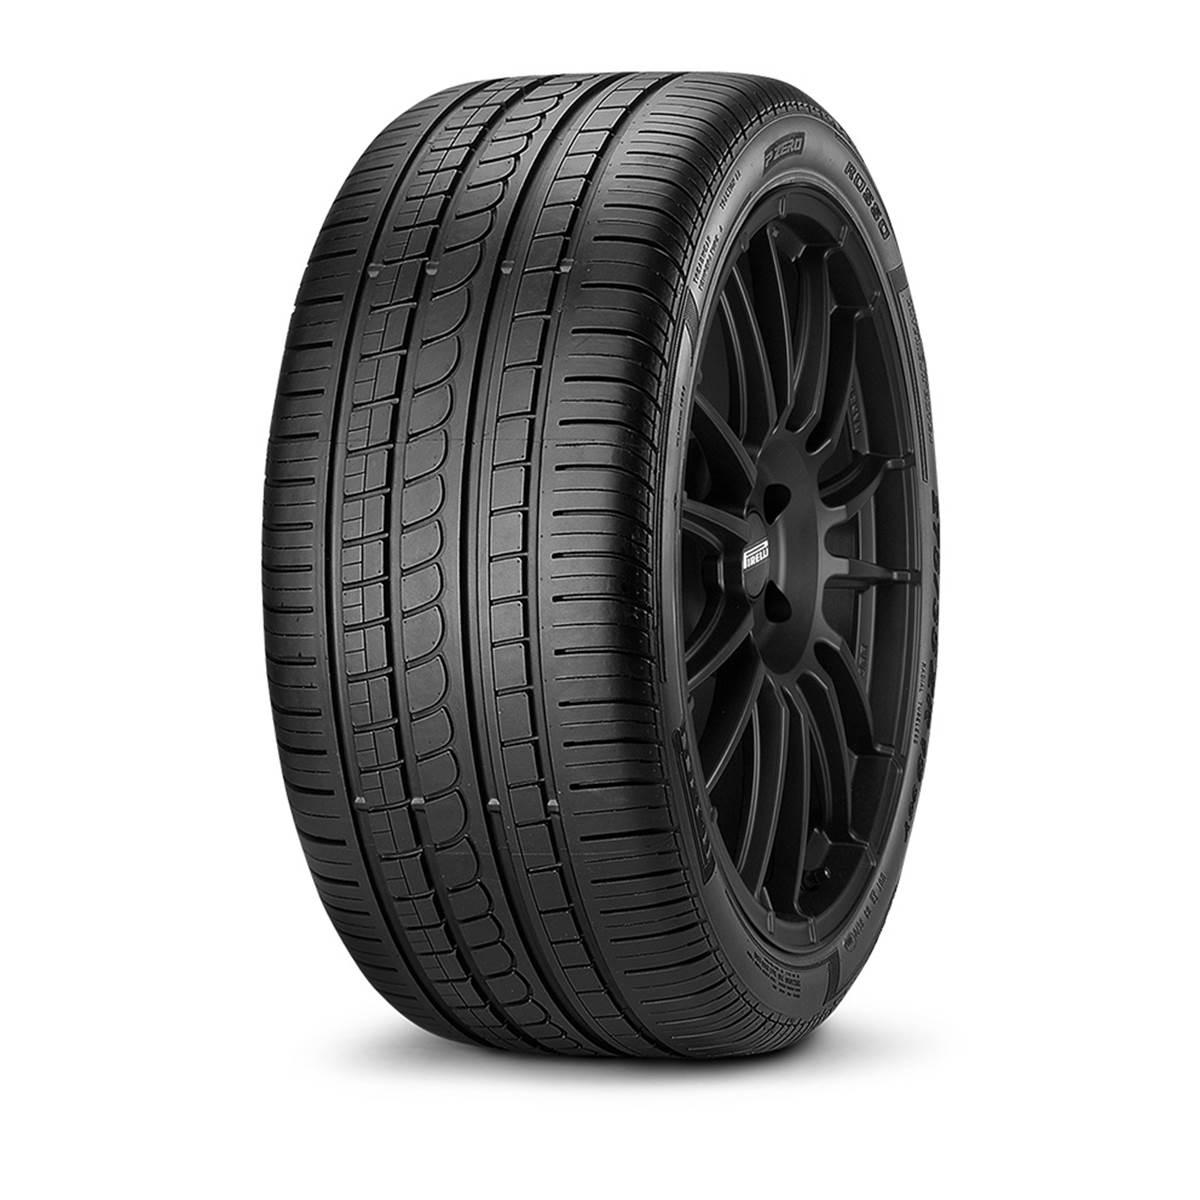 Pneu Pirelli 255/35R18 94Y Pzero Nero (Gt) XL